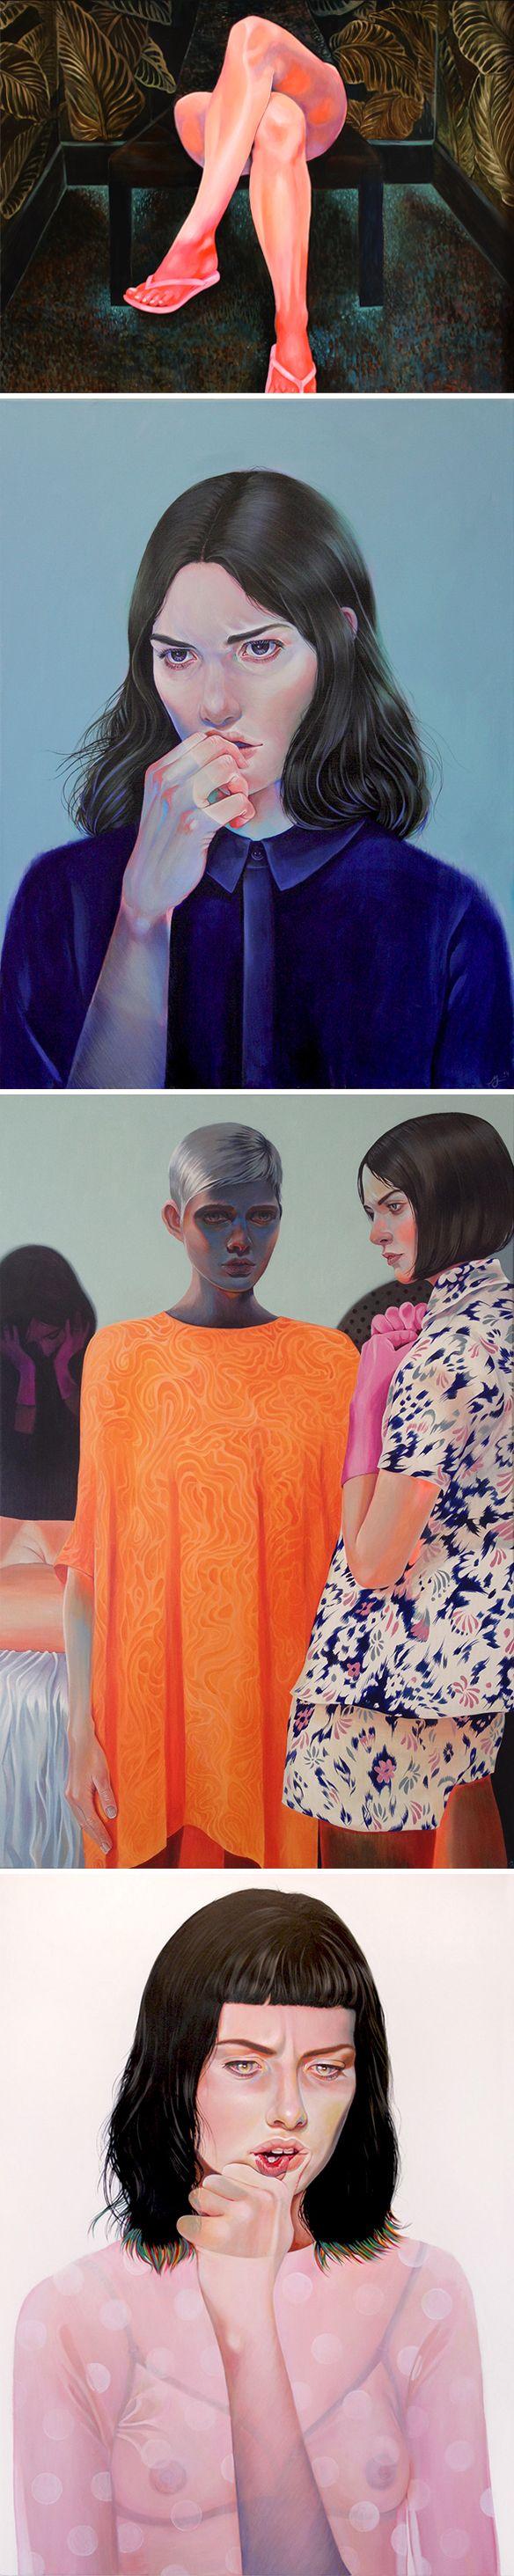 The Jealous Curator /// curated contemporary art /// martine johanna